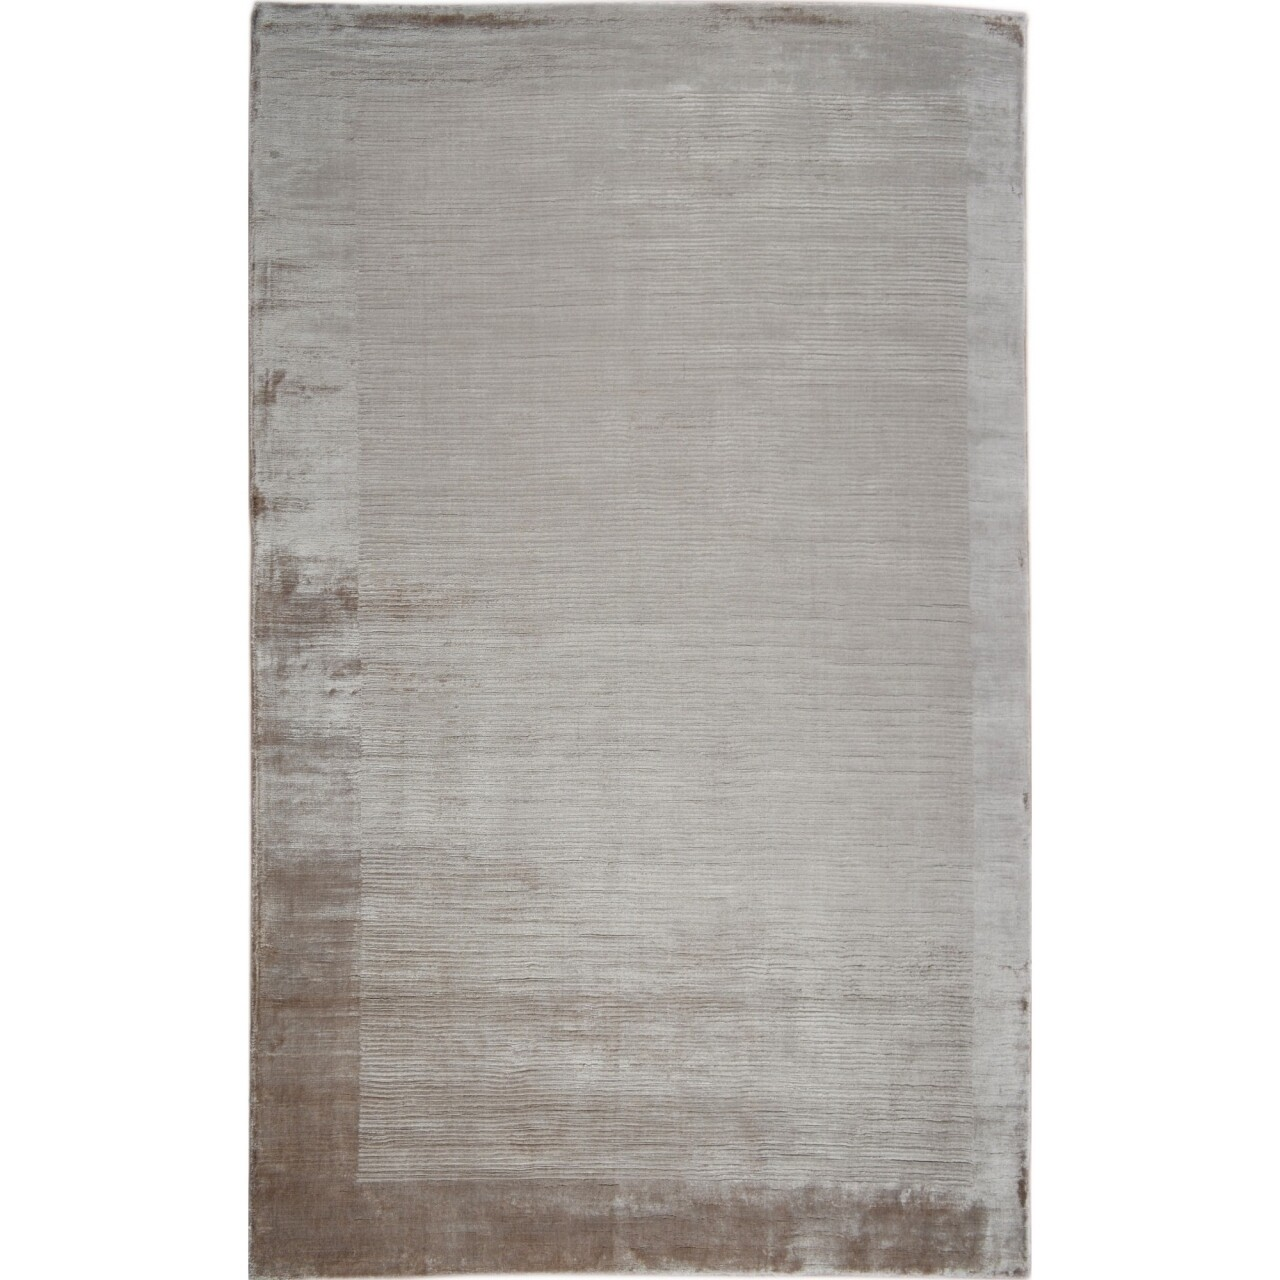 Covor rezistent Alya 3300 - Dark Mink, 170x240 cm